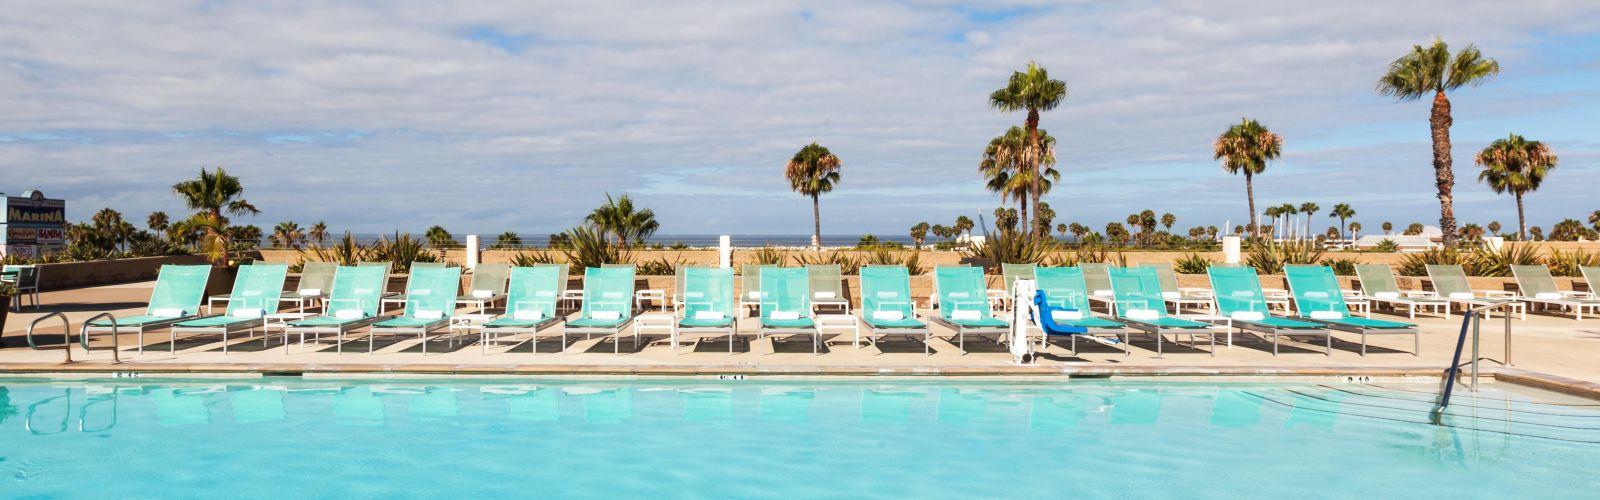 Swimming Pool Photo